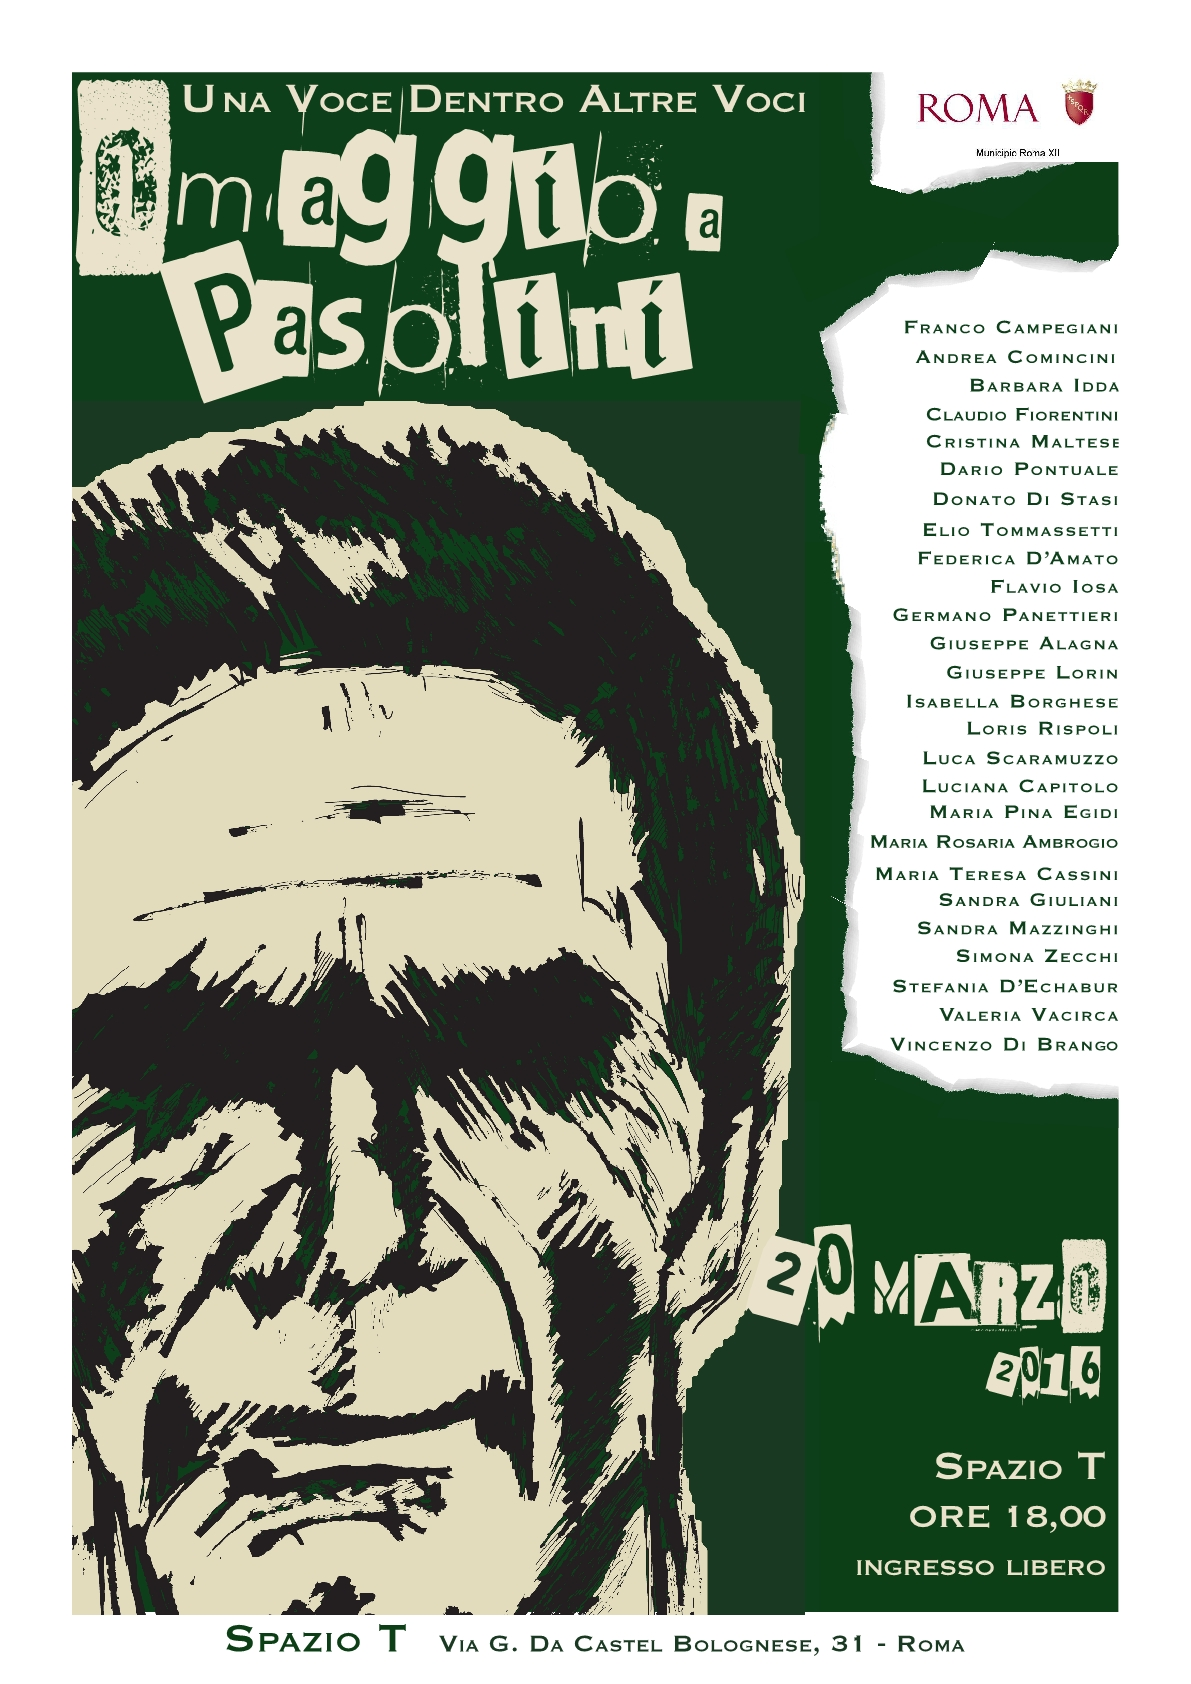 PasoliniR21